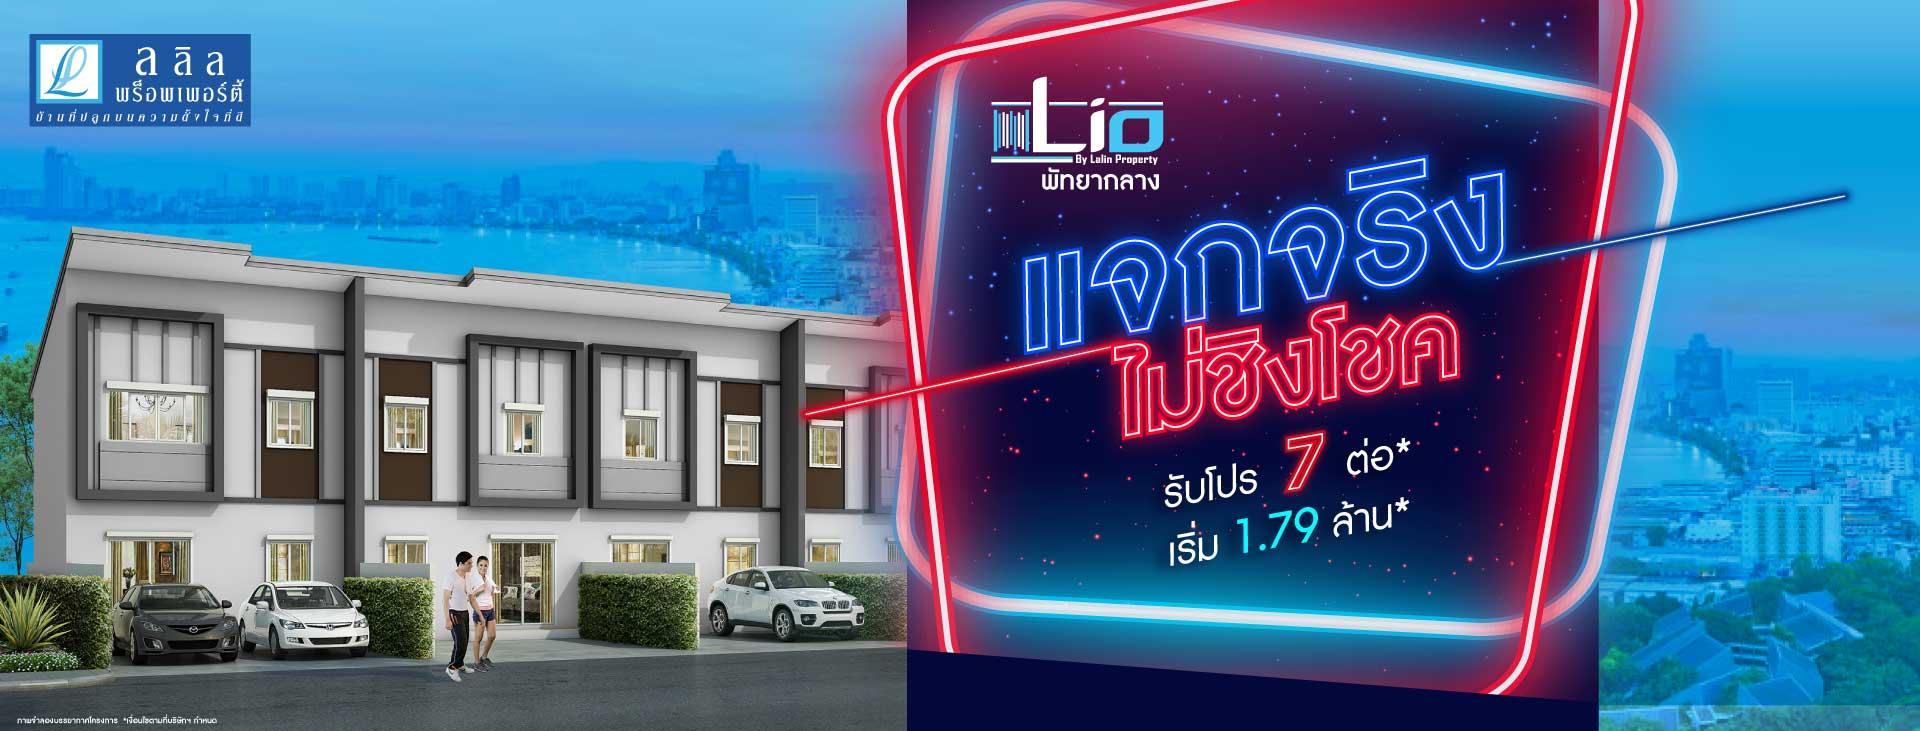 Lio-พัทยากลาง-ทาวน์โฮมพัทยา-บ้านพัทยา